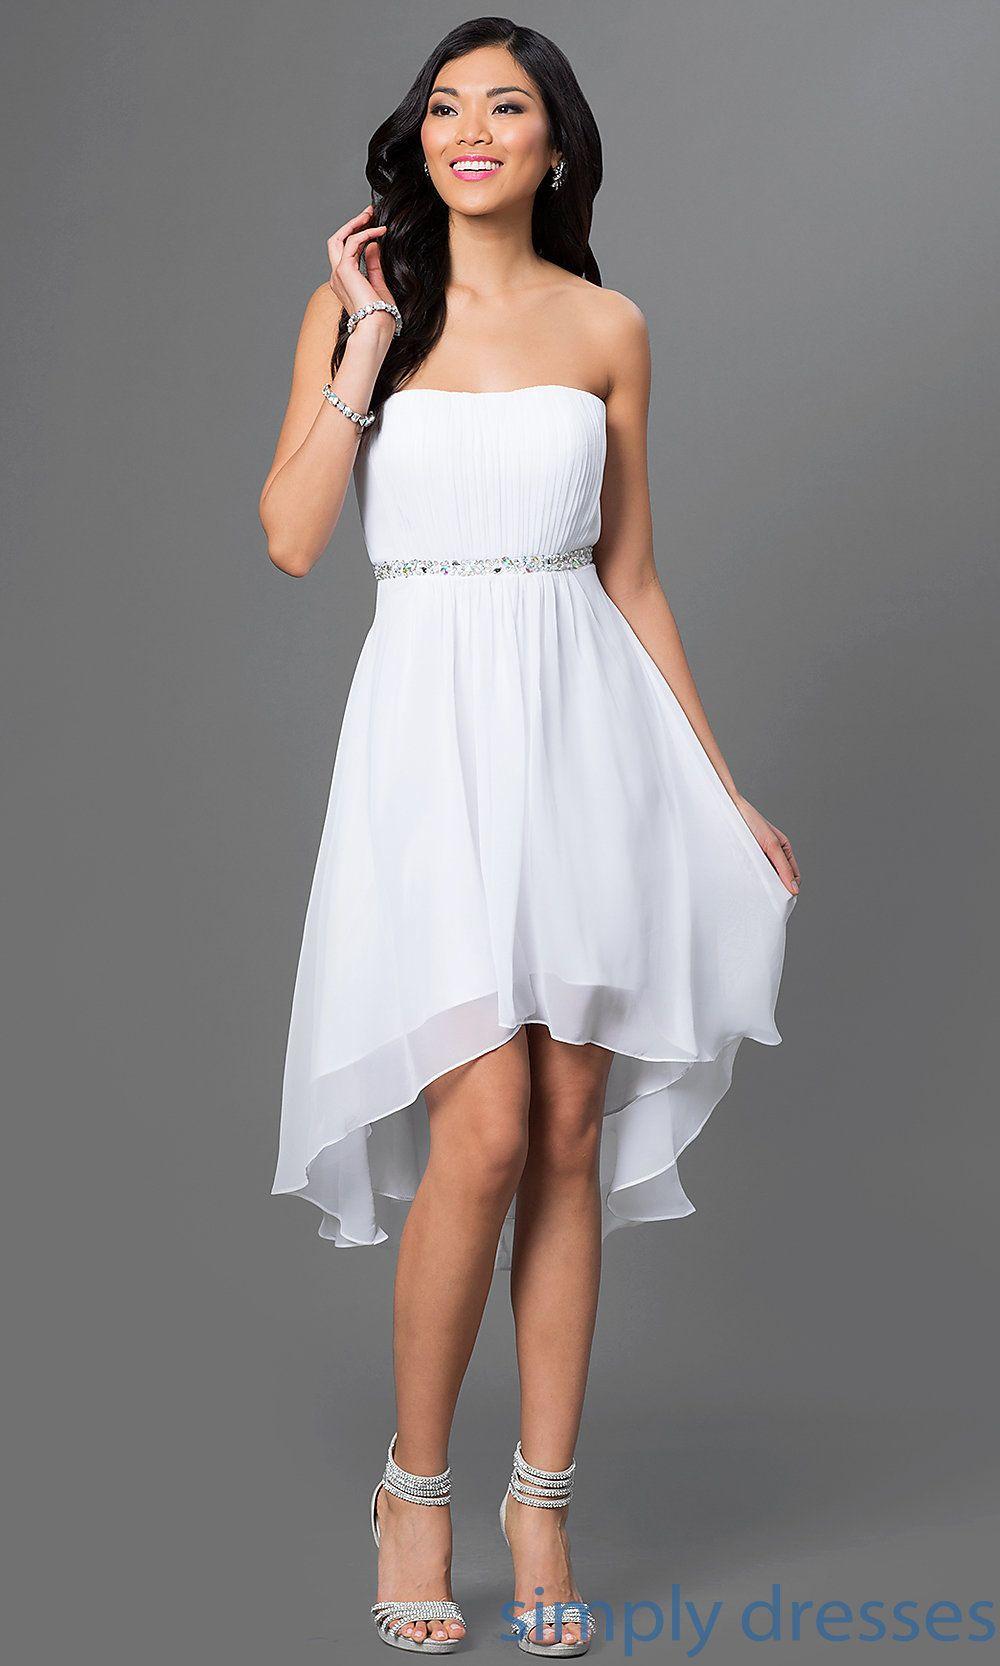 High low strapless dress dqw graduation ready